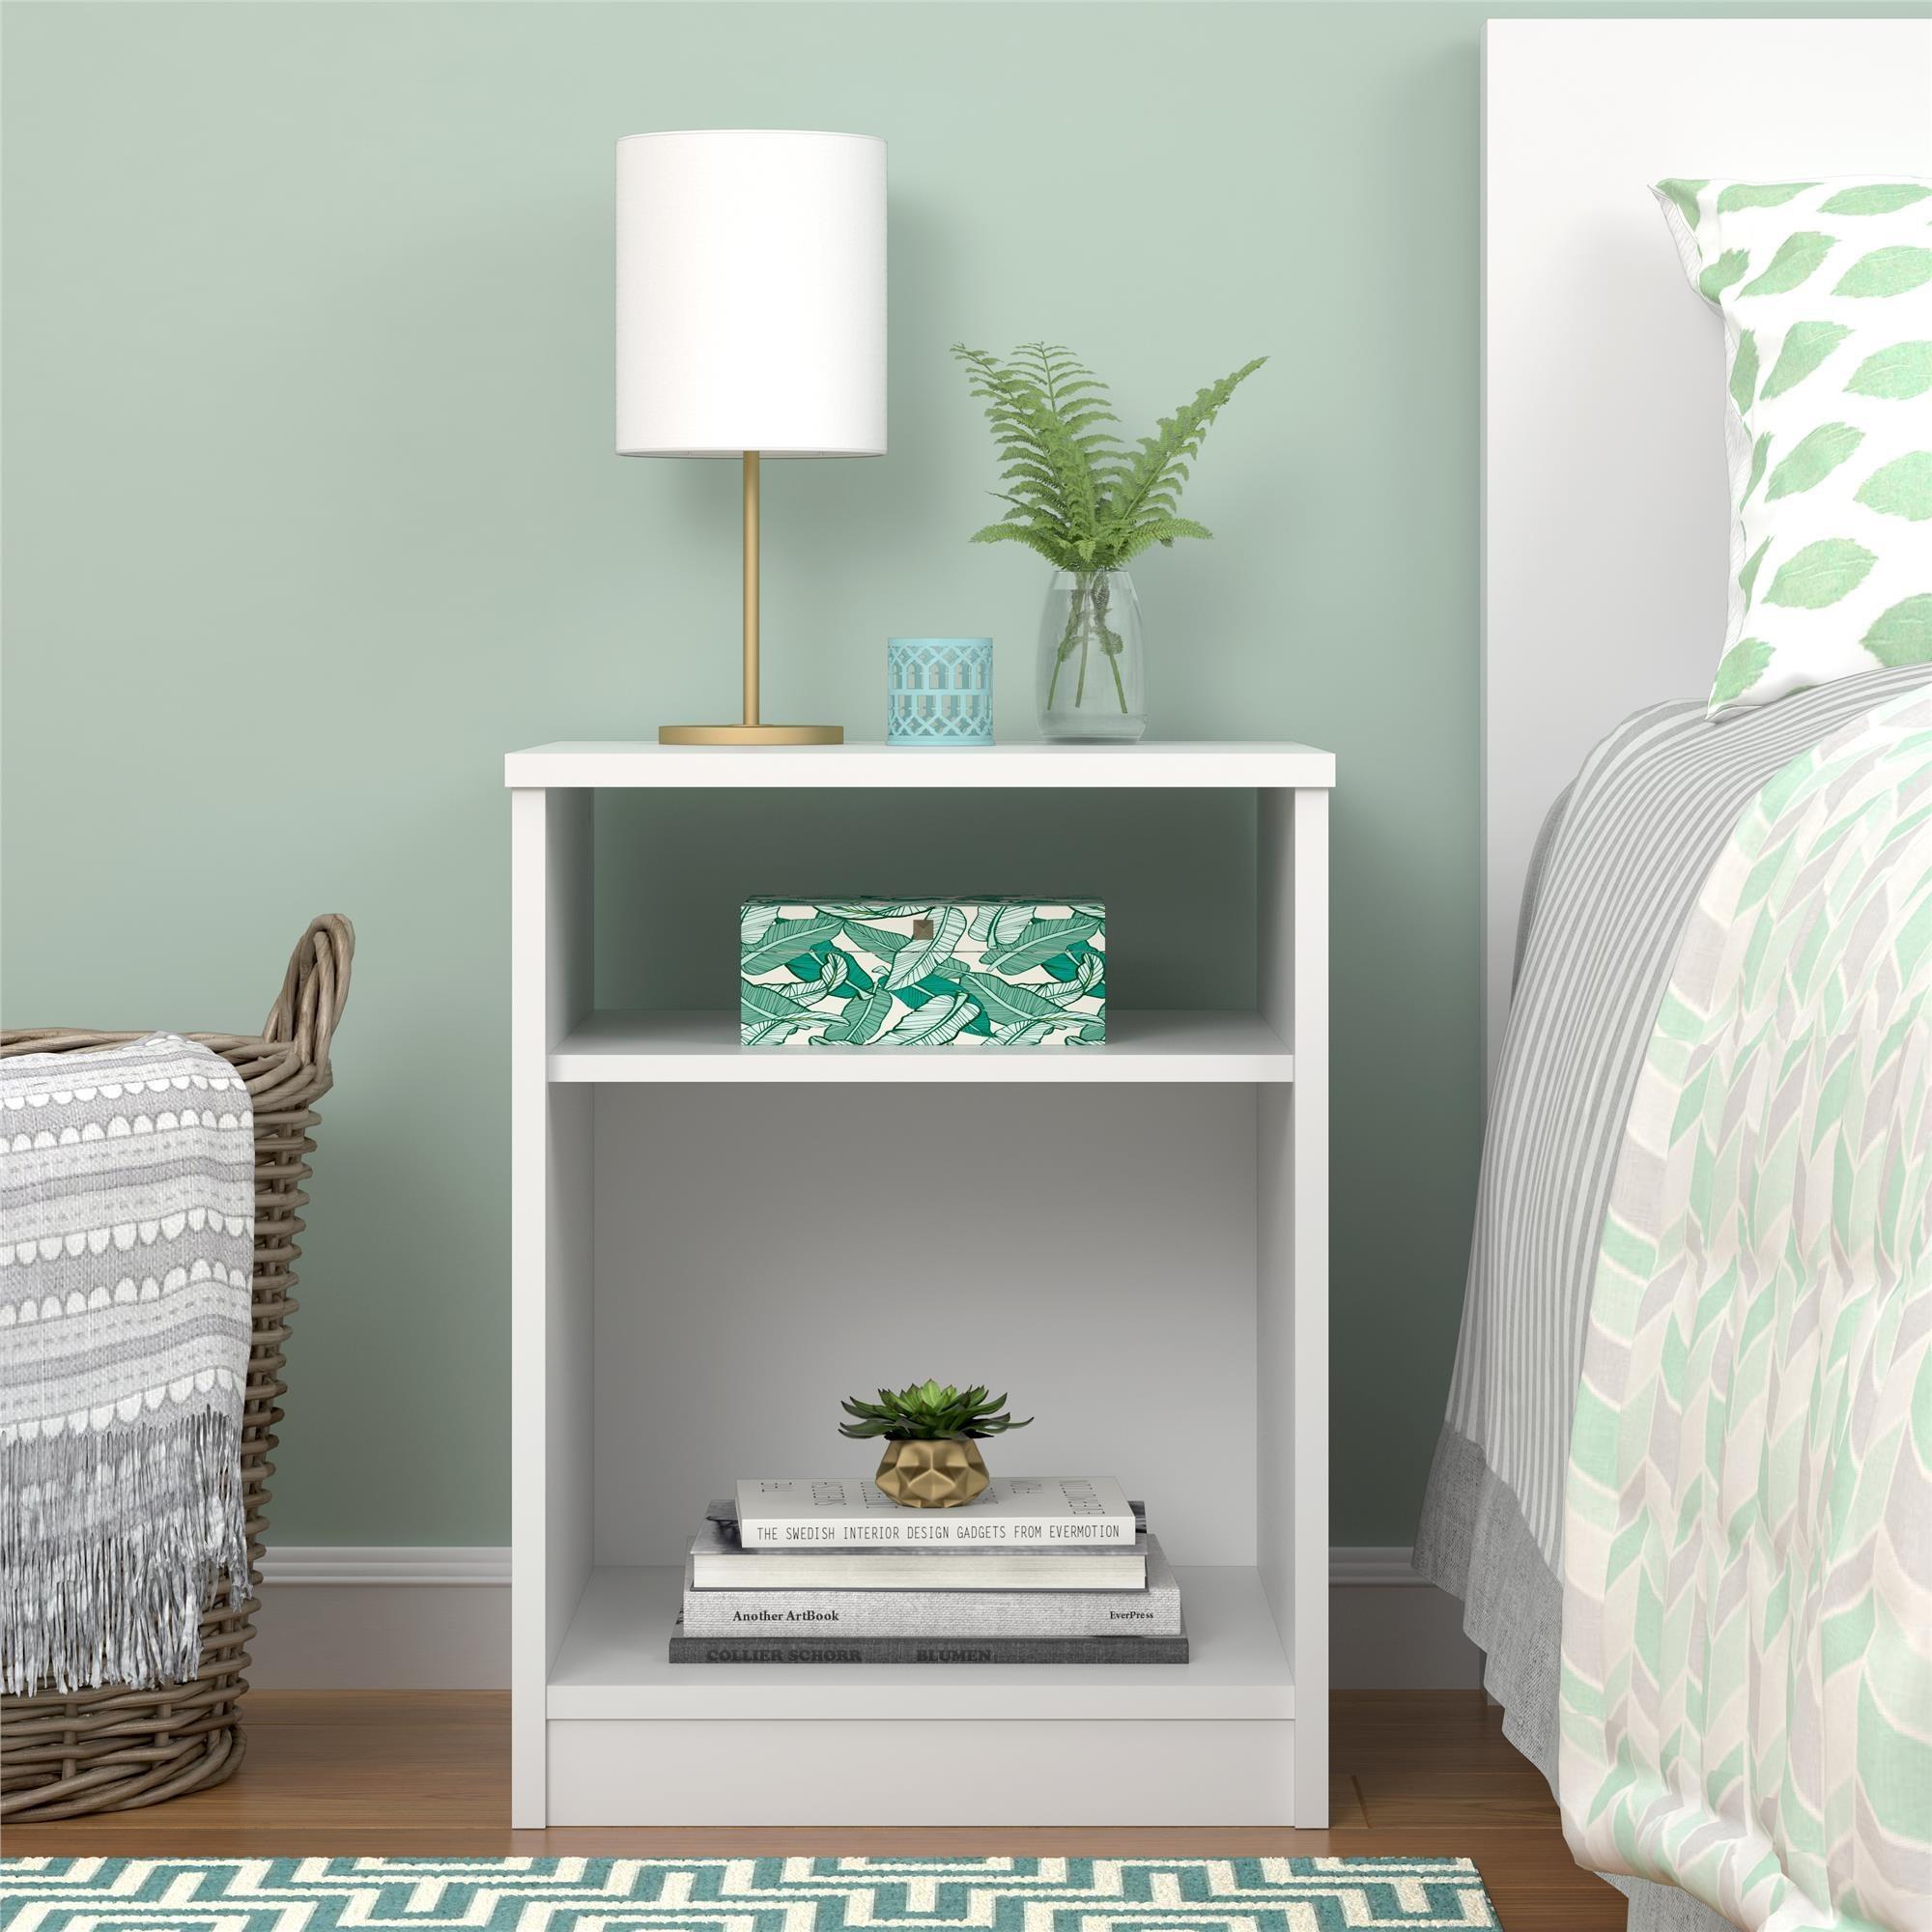 The white two-shelf nightstand